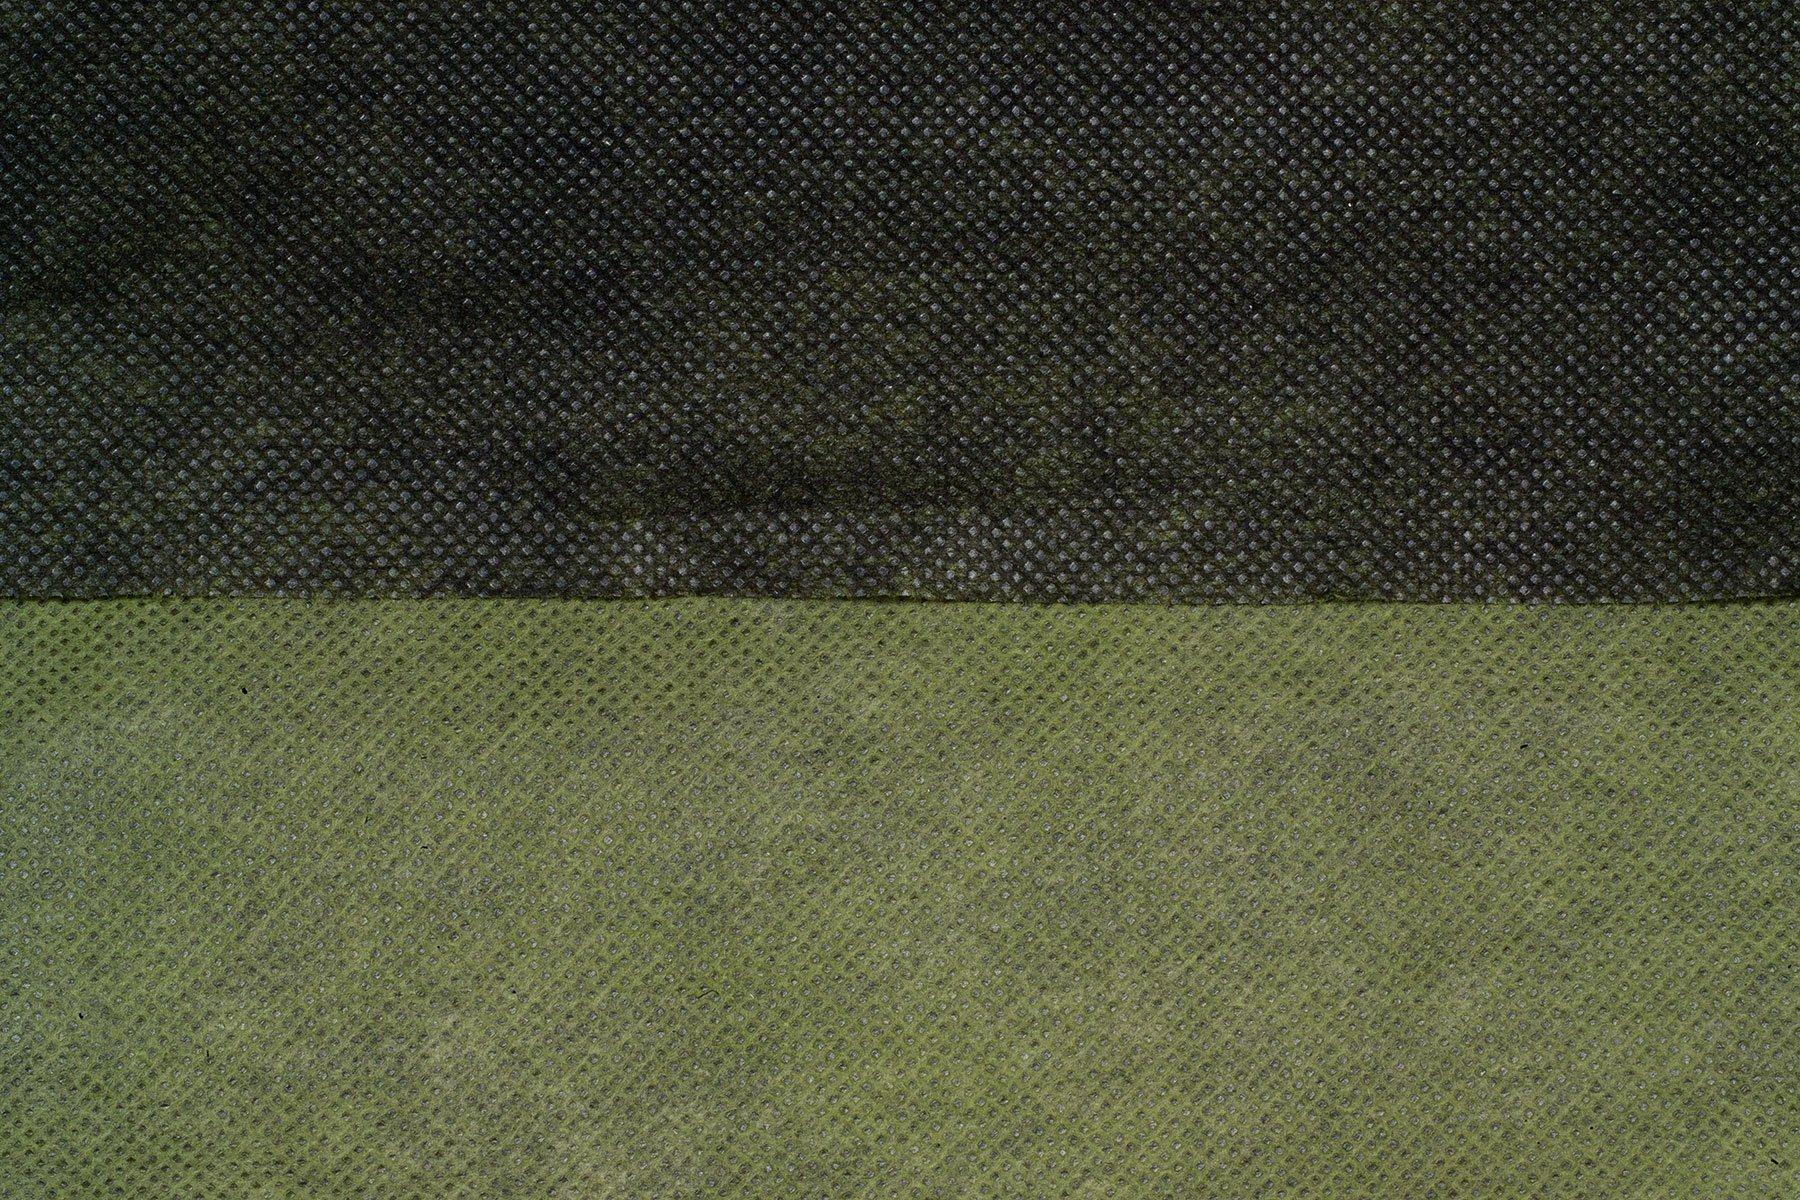 Folie microporoasa mulcire Protex, neagra-verde, 2 x 5 m, 60 gr - Verdon